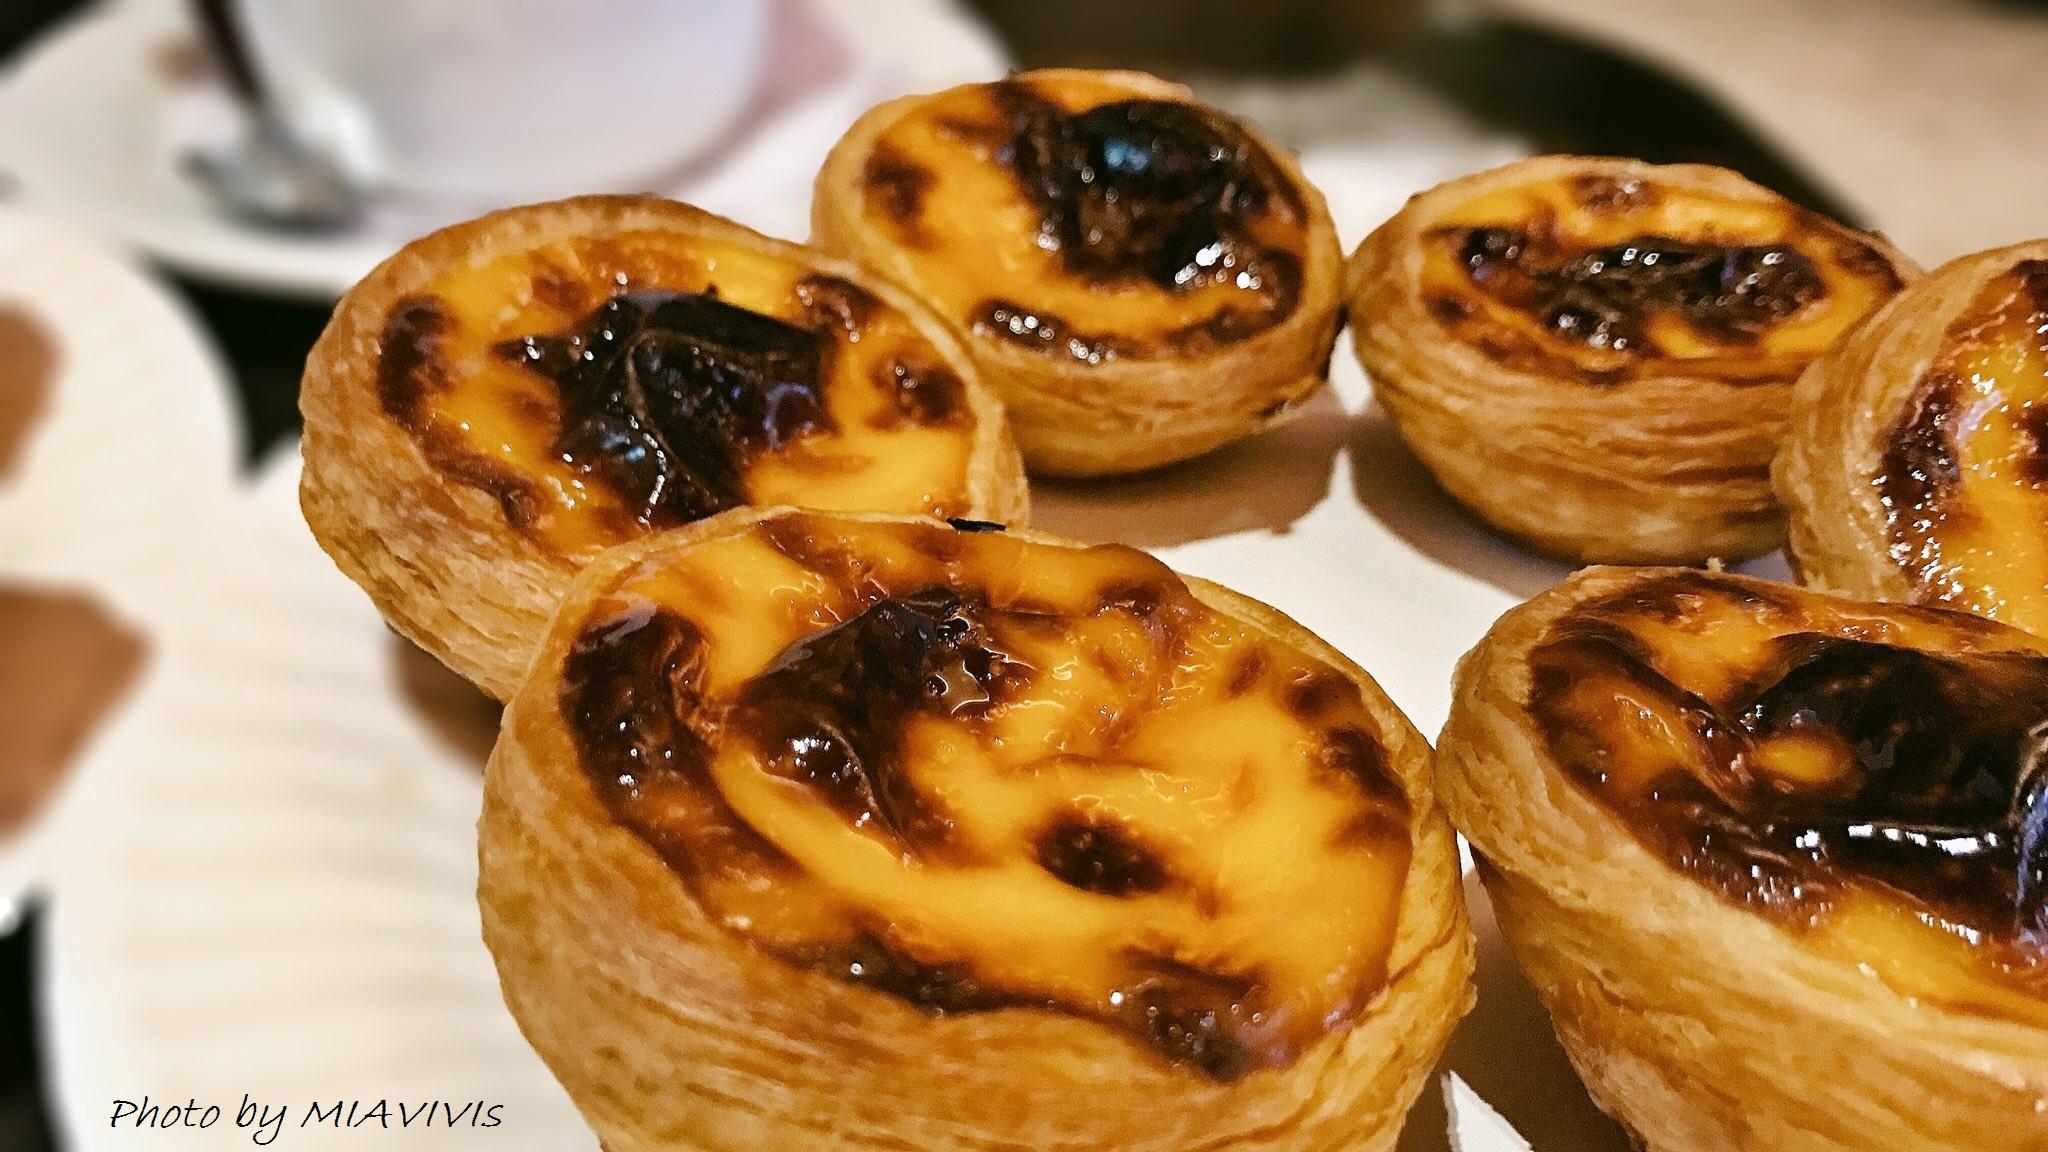 pastel de nata__portuguess egg tart